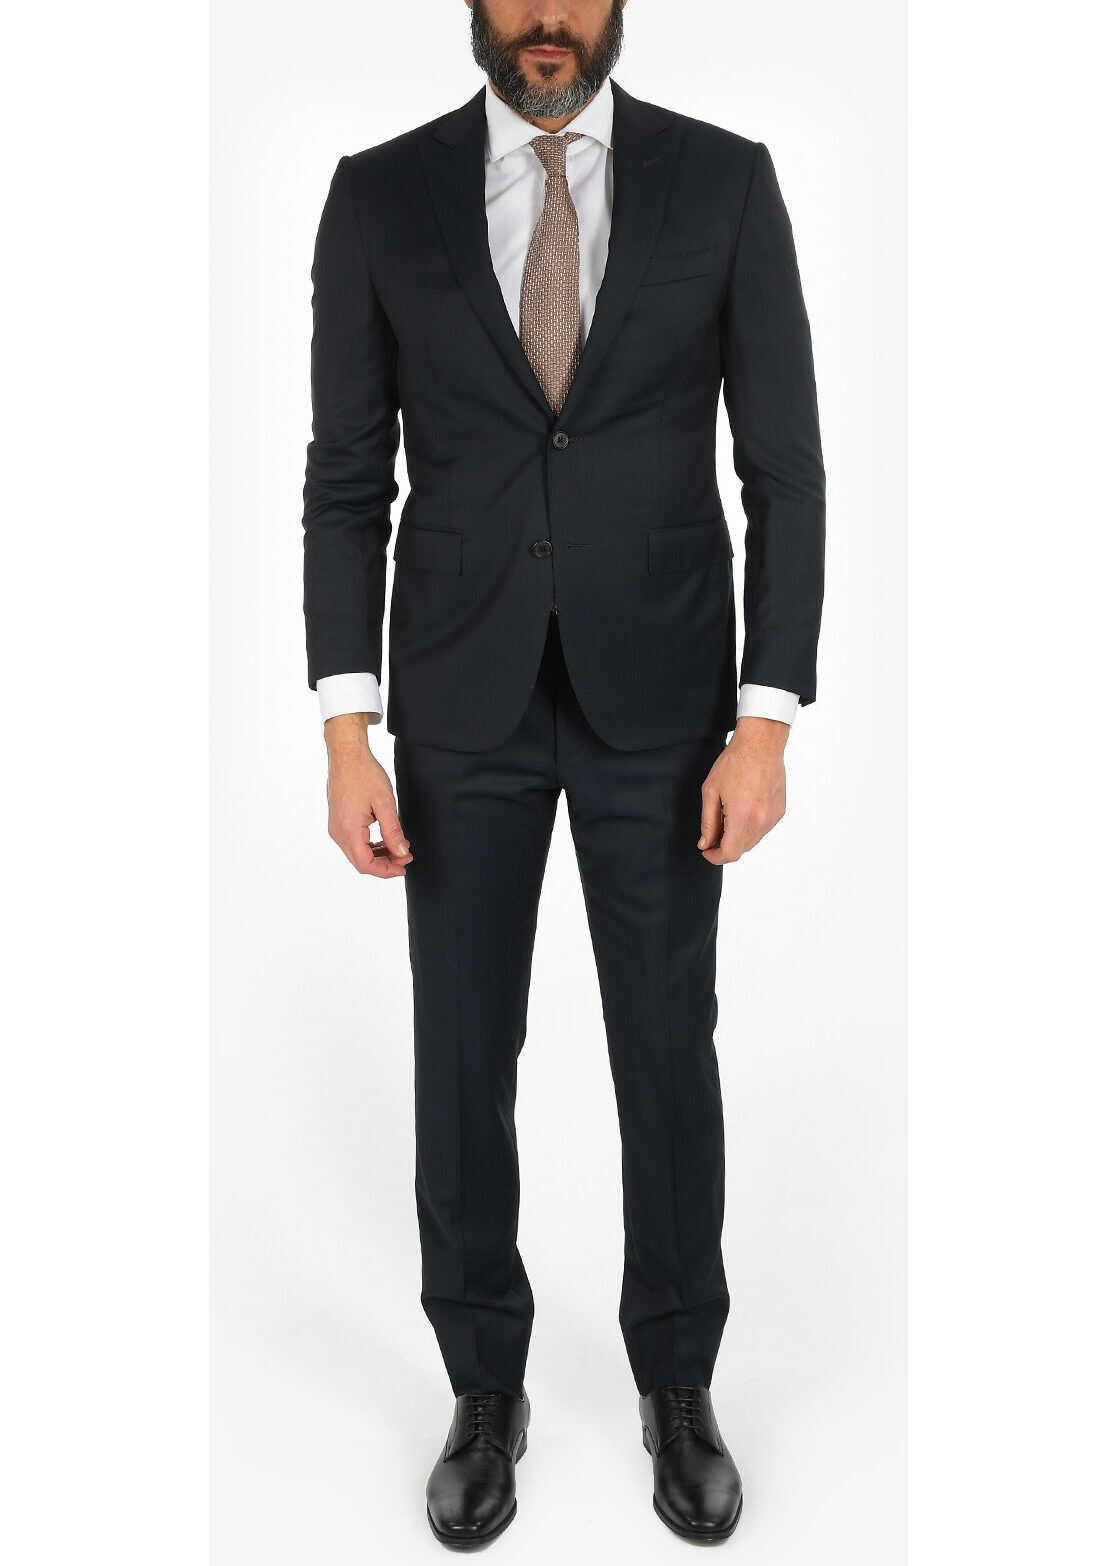 CORNELIANI ACADEMY virgin wool 2-button suit BLUE imagine